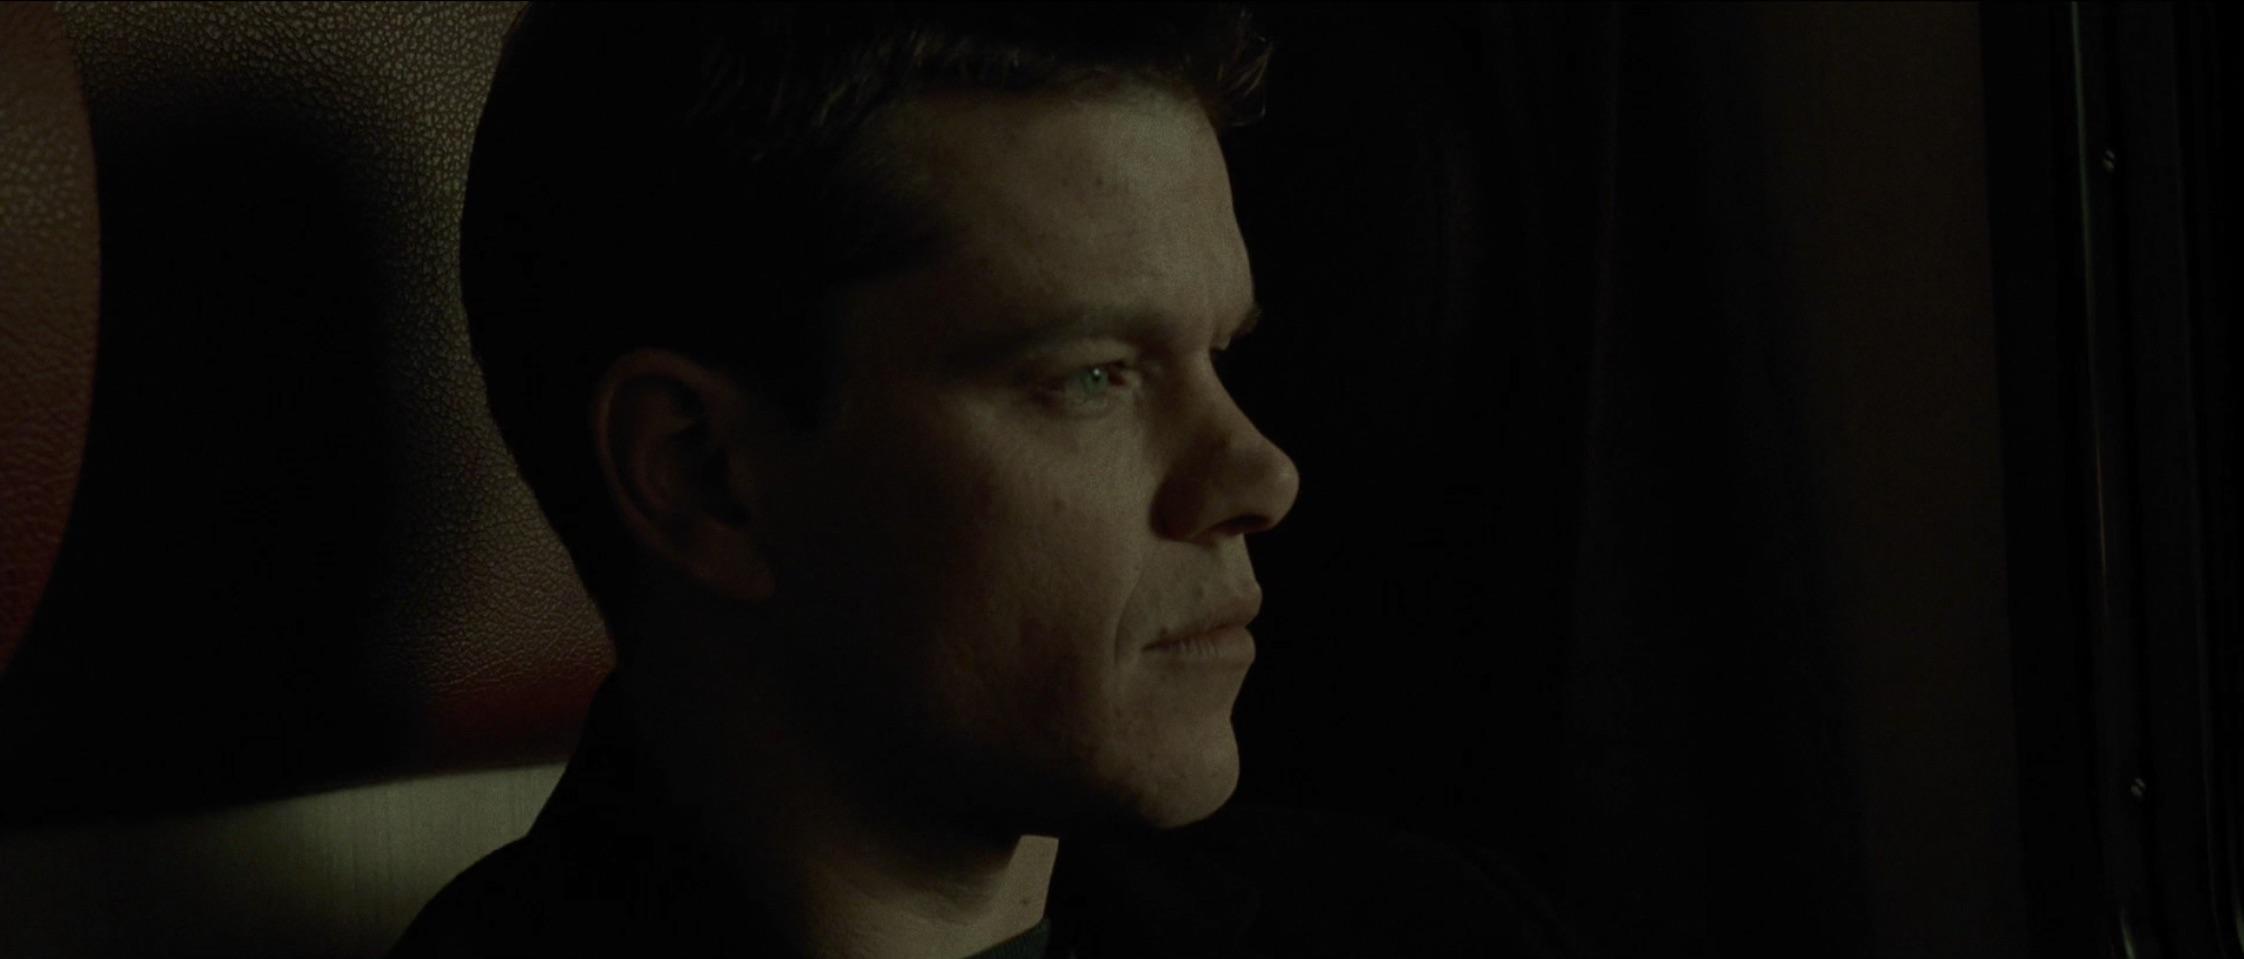 Jason Bourne Side profile